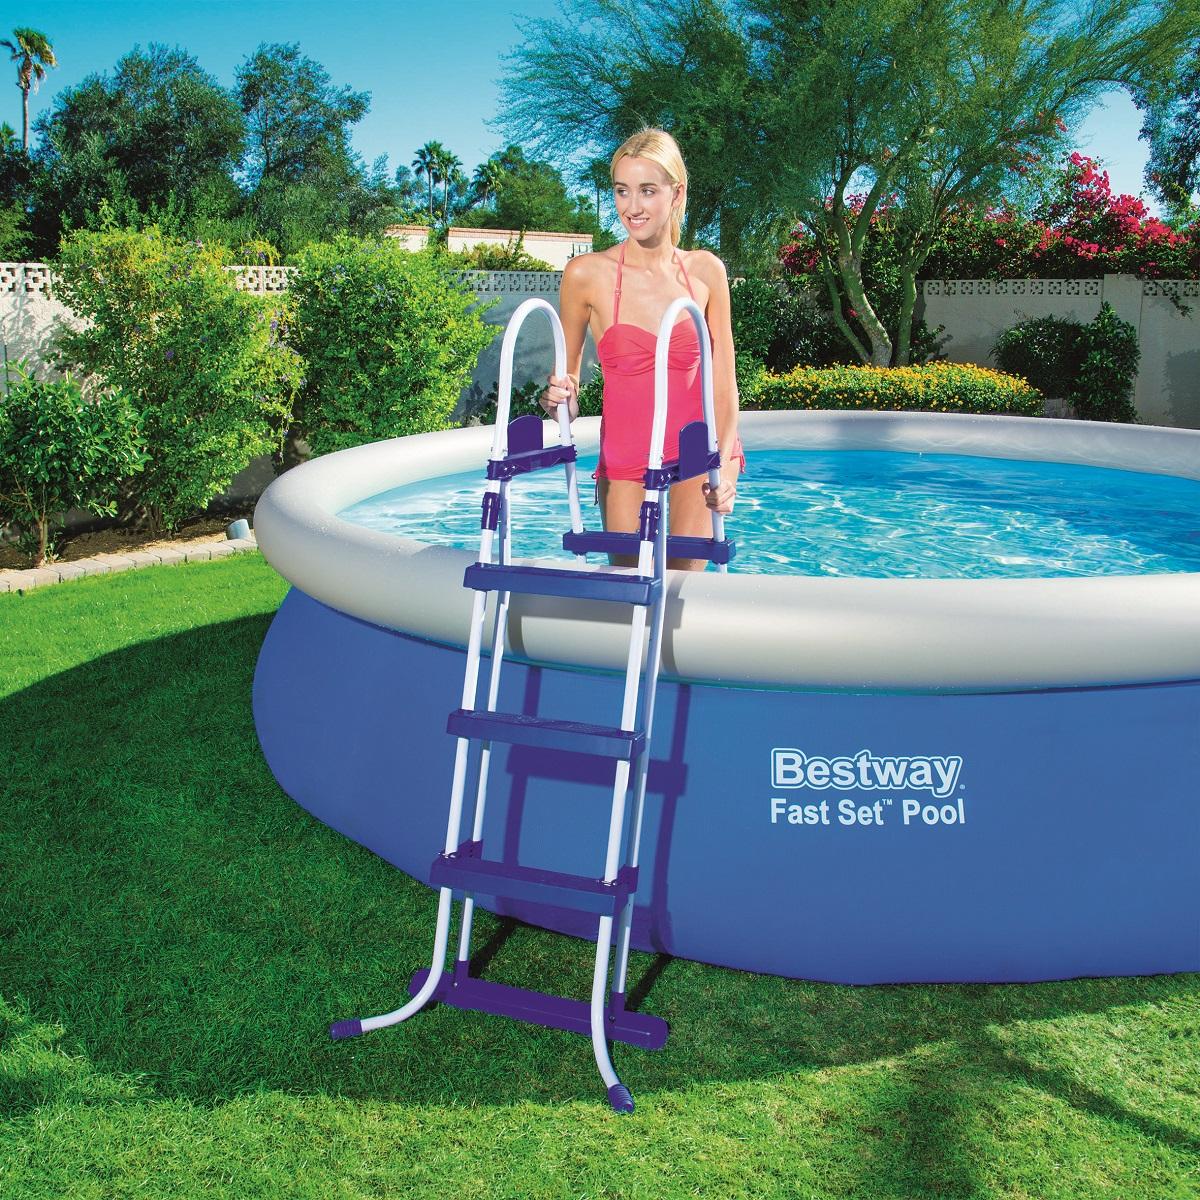 Schodíky do bazénu s výškou 107 cm